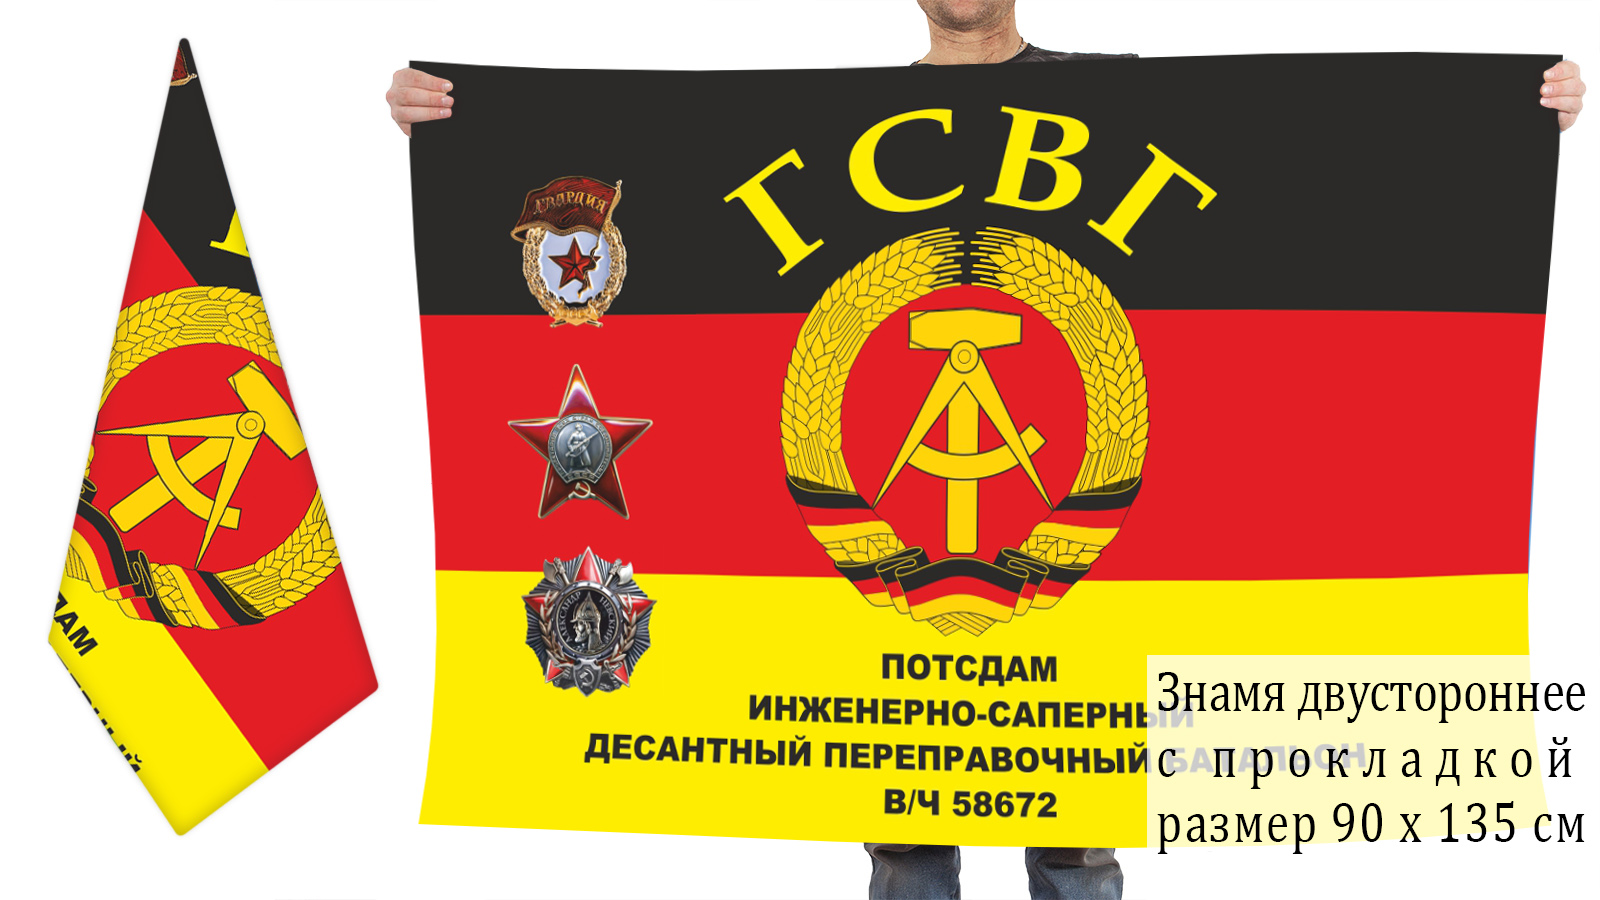 Двусторонний флаг ГСВГ в/ч 58672 Потсдам